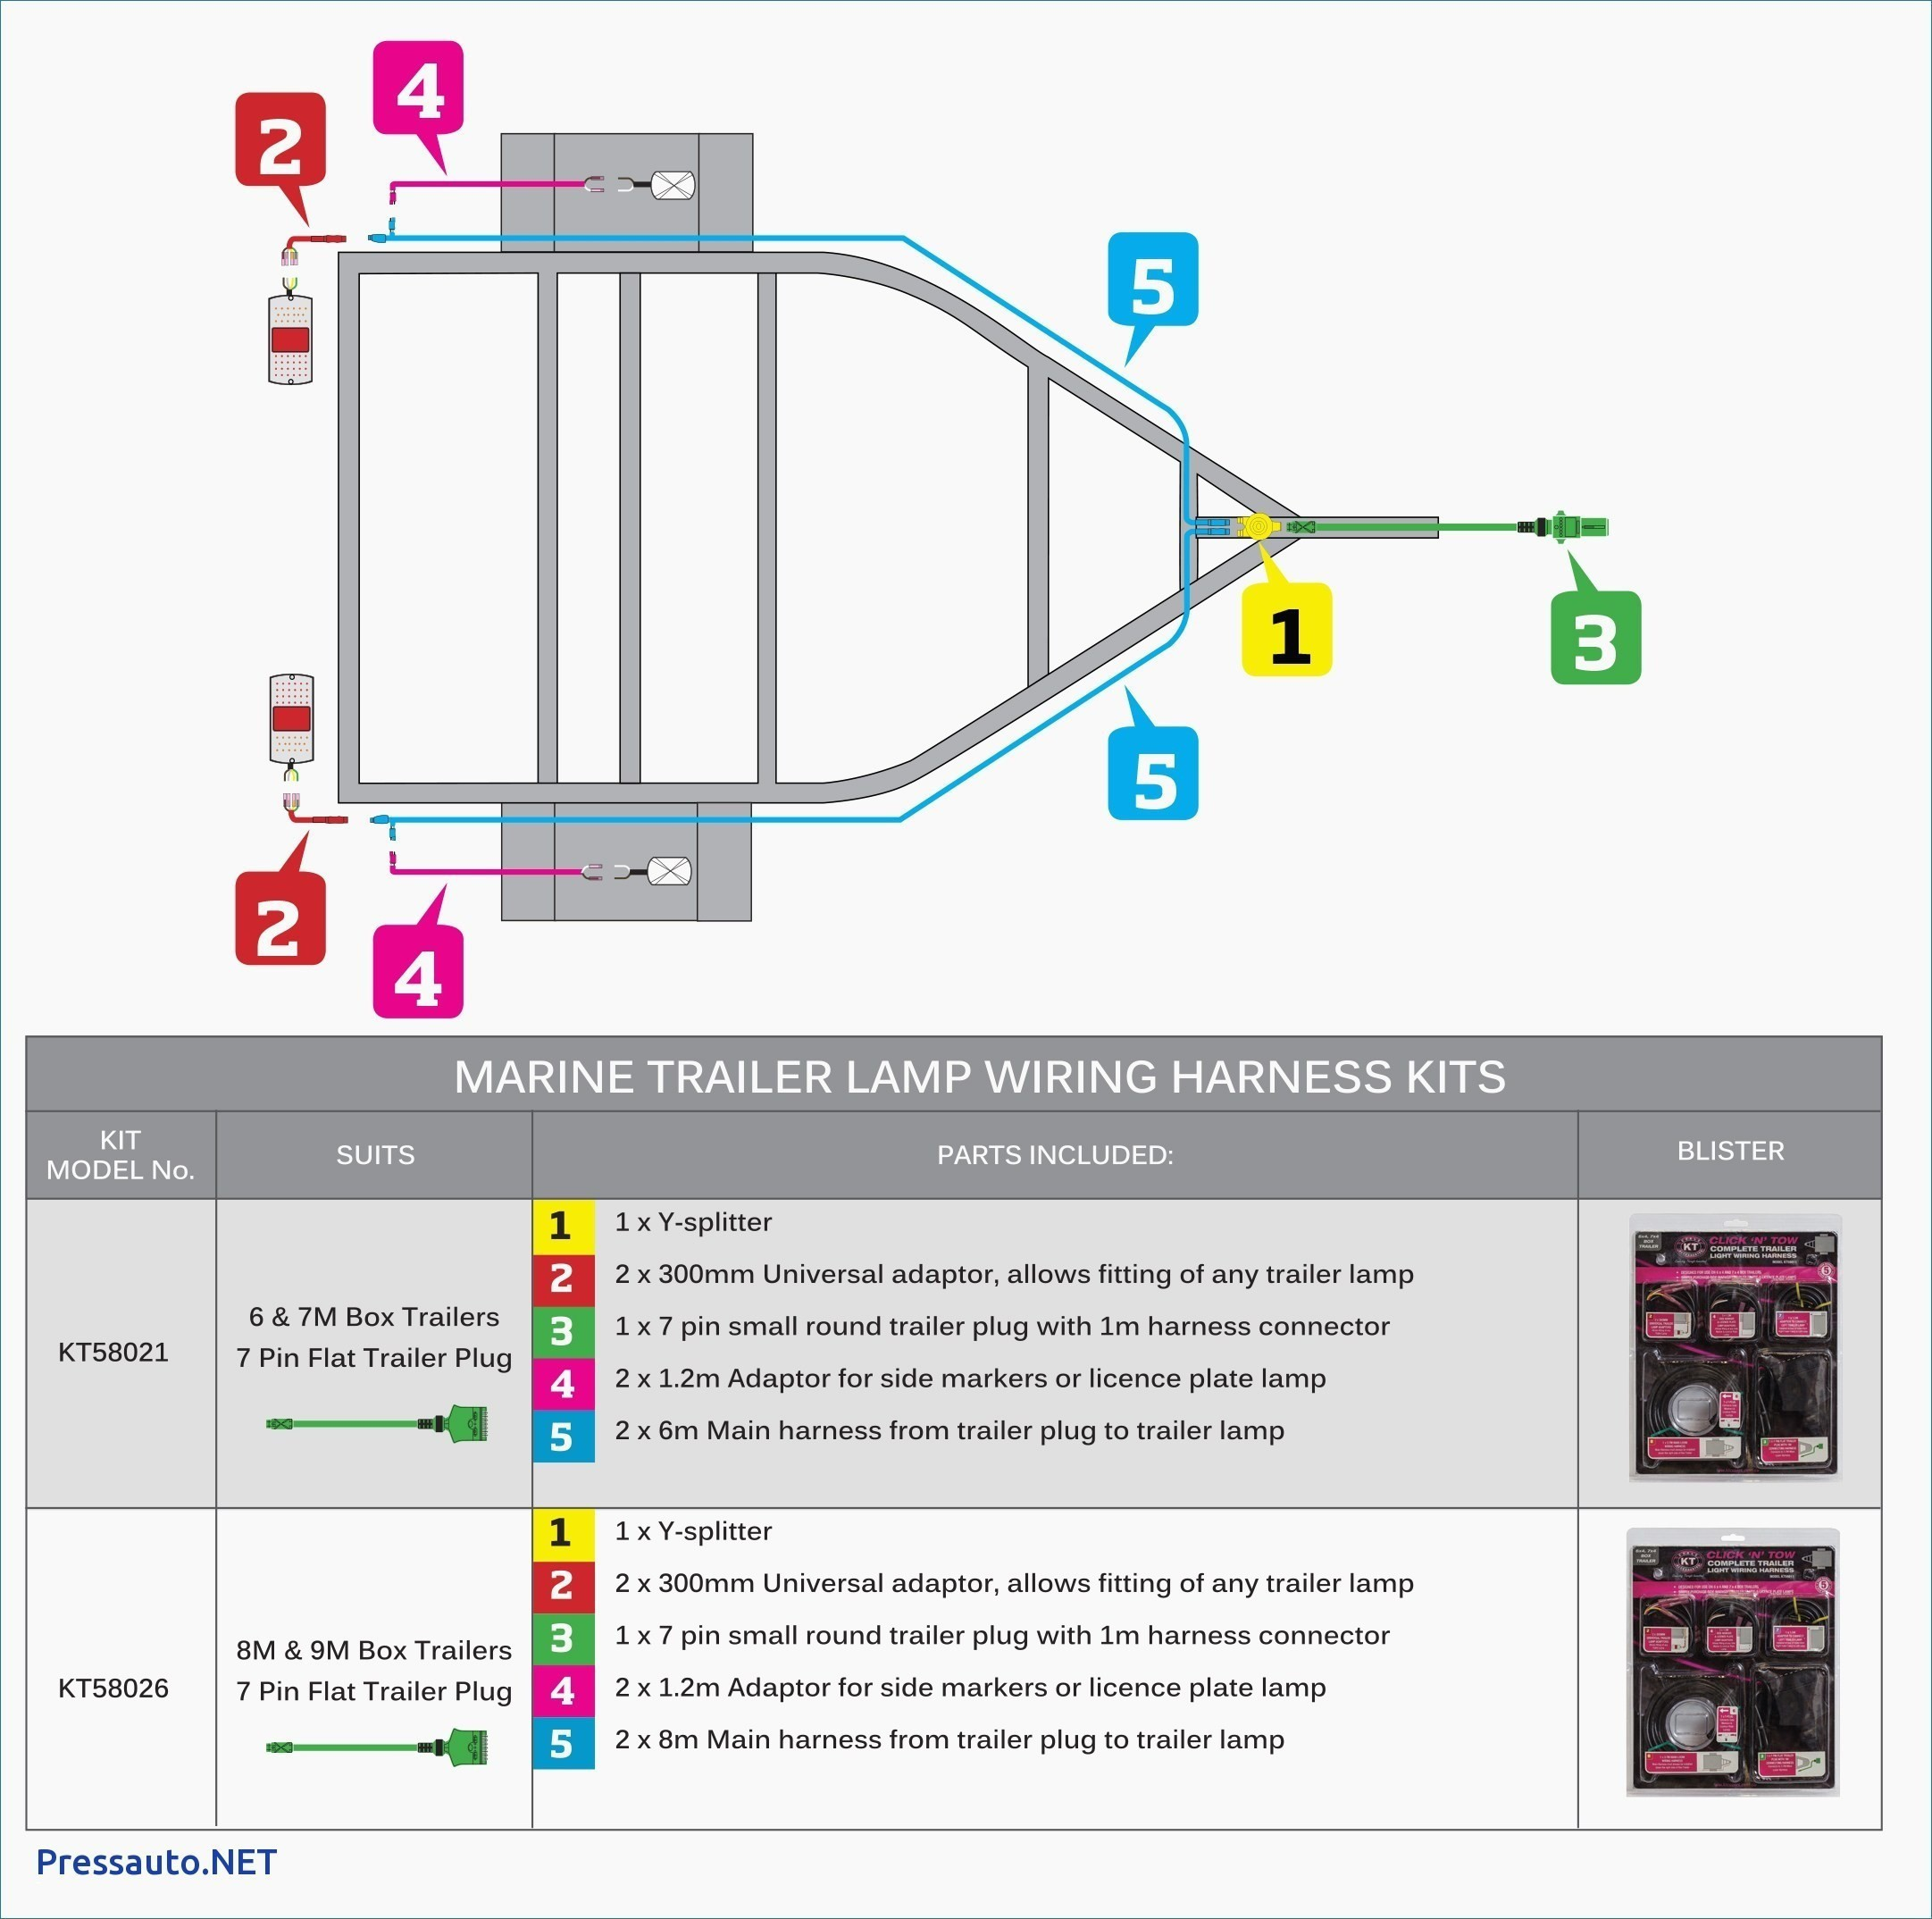 Tow Vehicle Wiring Diagram Elegant Wiring Diagram Trailer Plug Australia Best Wiring Diagram For Car